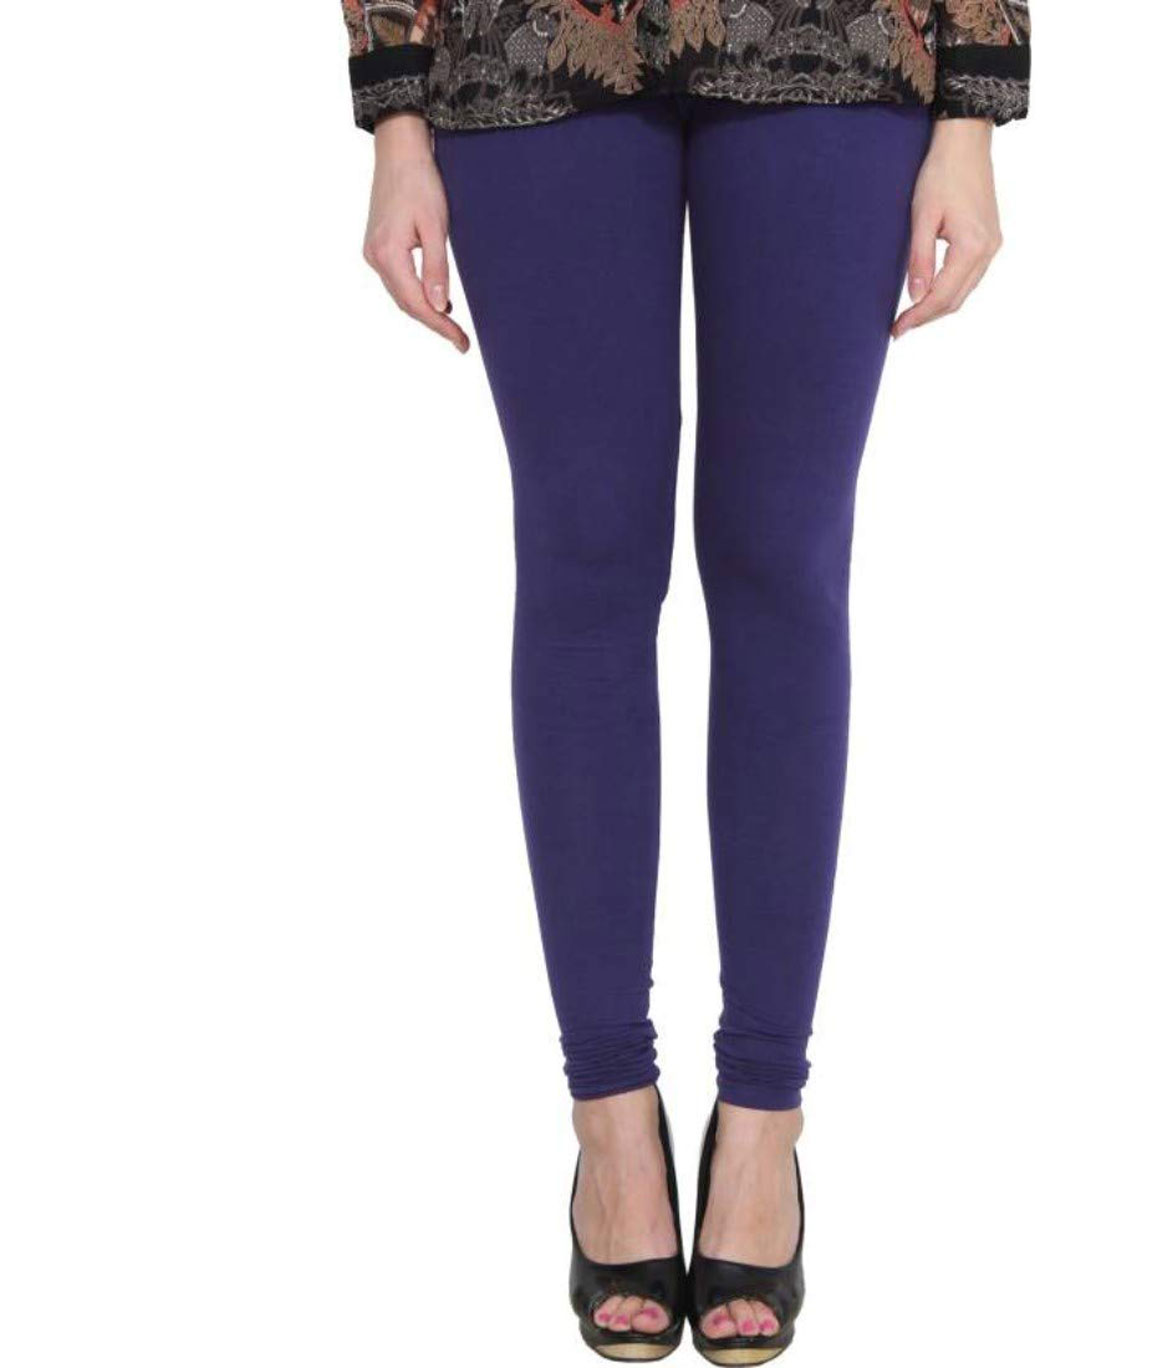 Swag Wear Churidar Legging(navy blue)